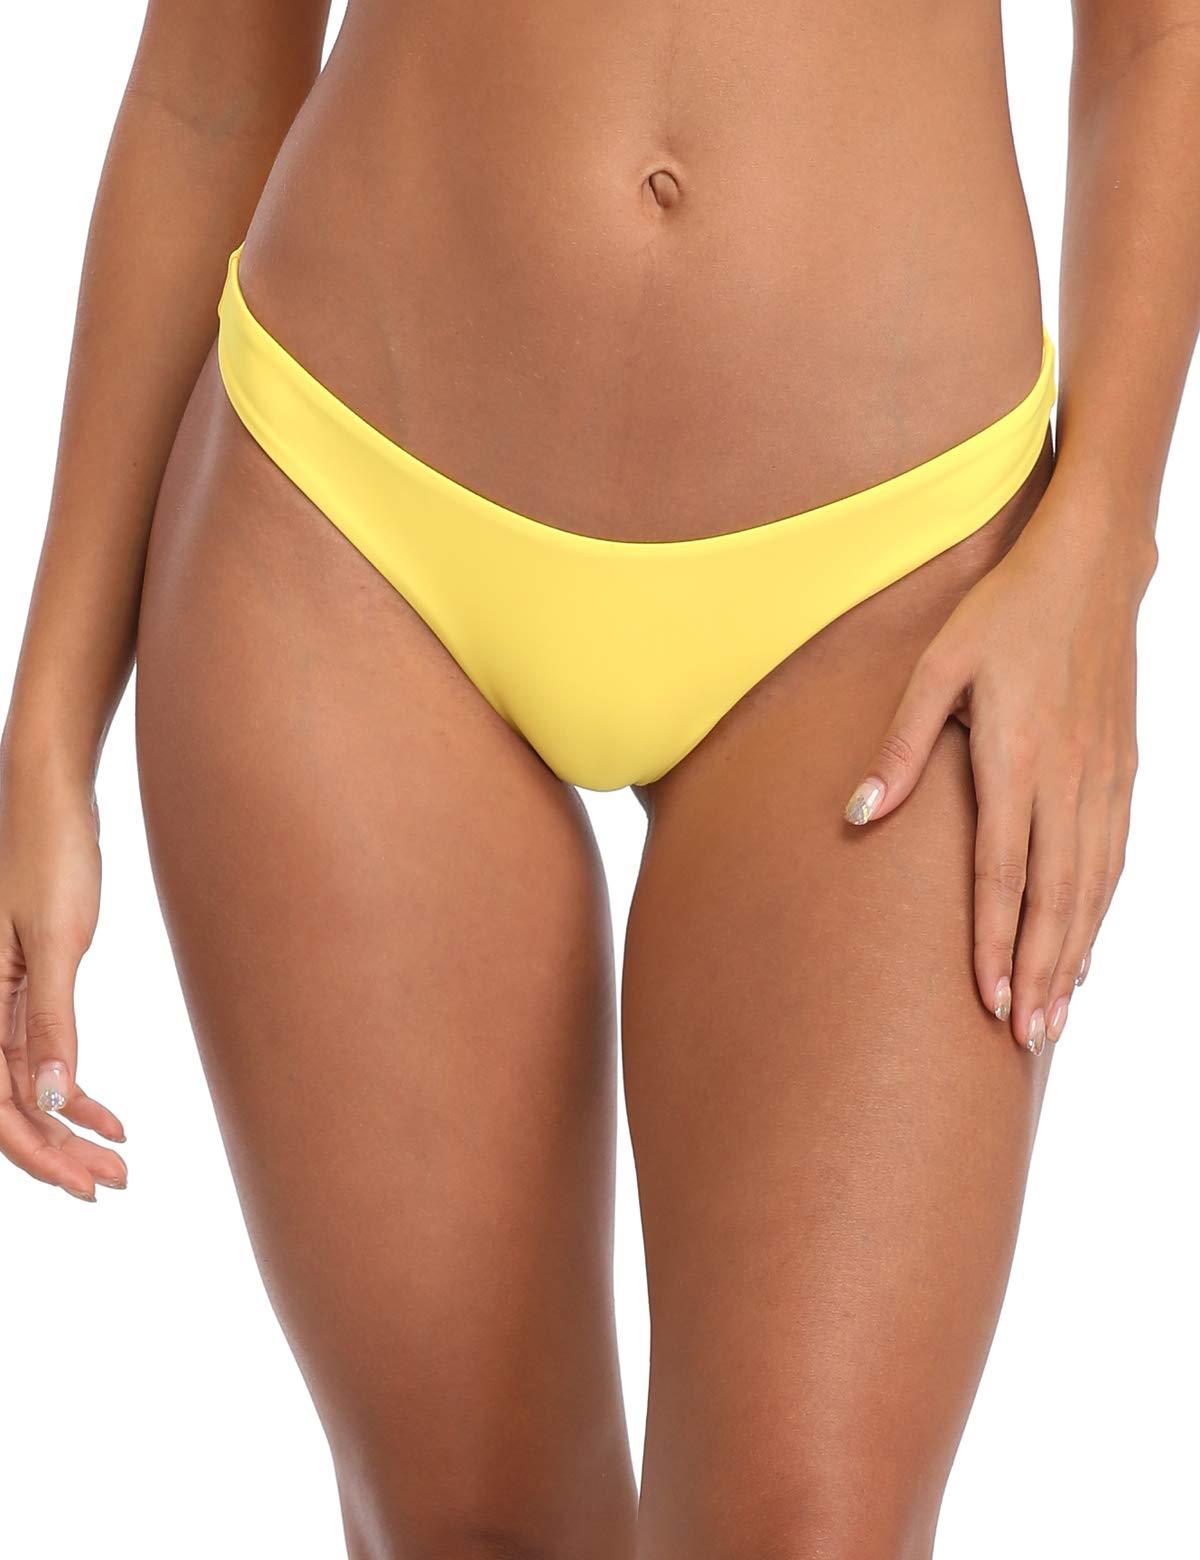 354745e05f2c1 Best Rated in Women s Bikini bottoms   Helpful Customer Reviews ...